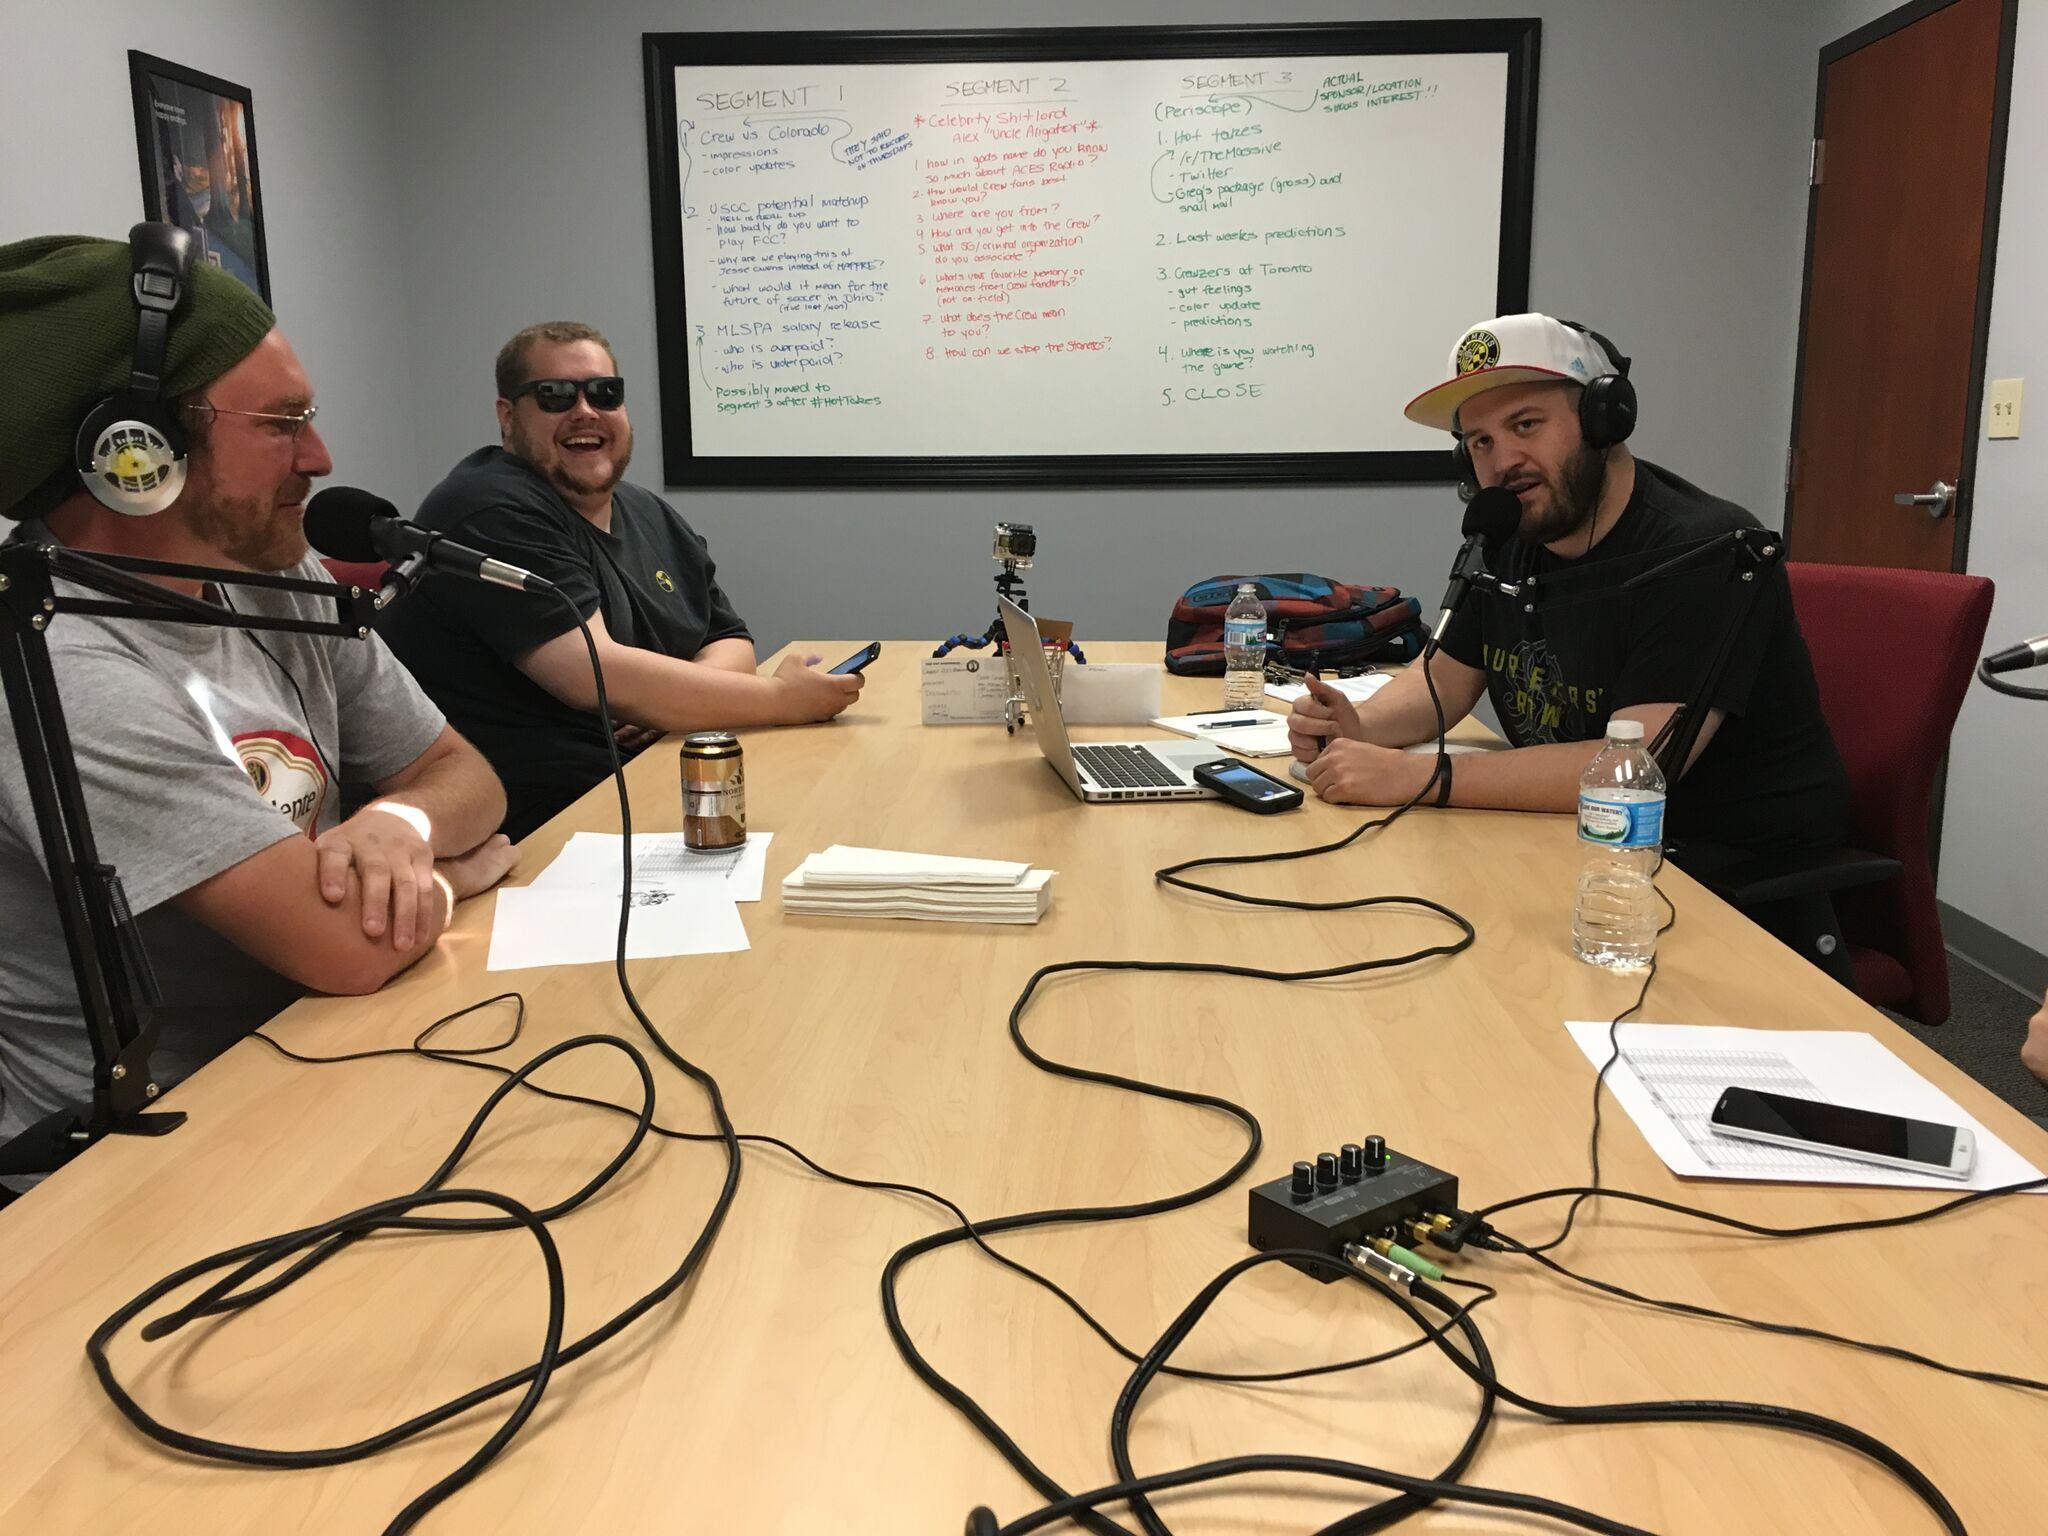 John interviews Alex Thomas and Jordan Kennedy.